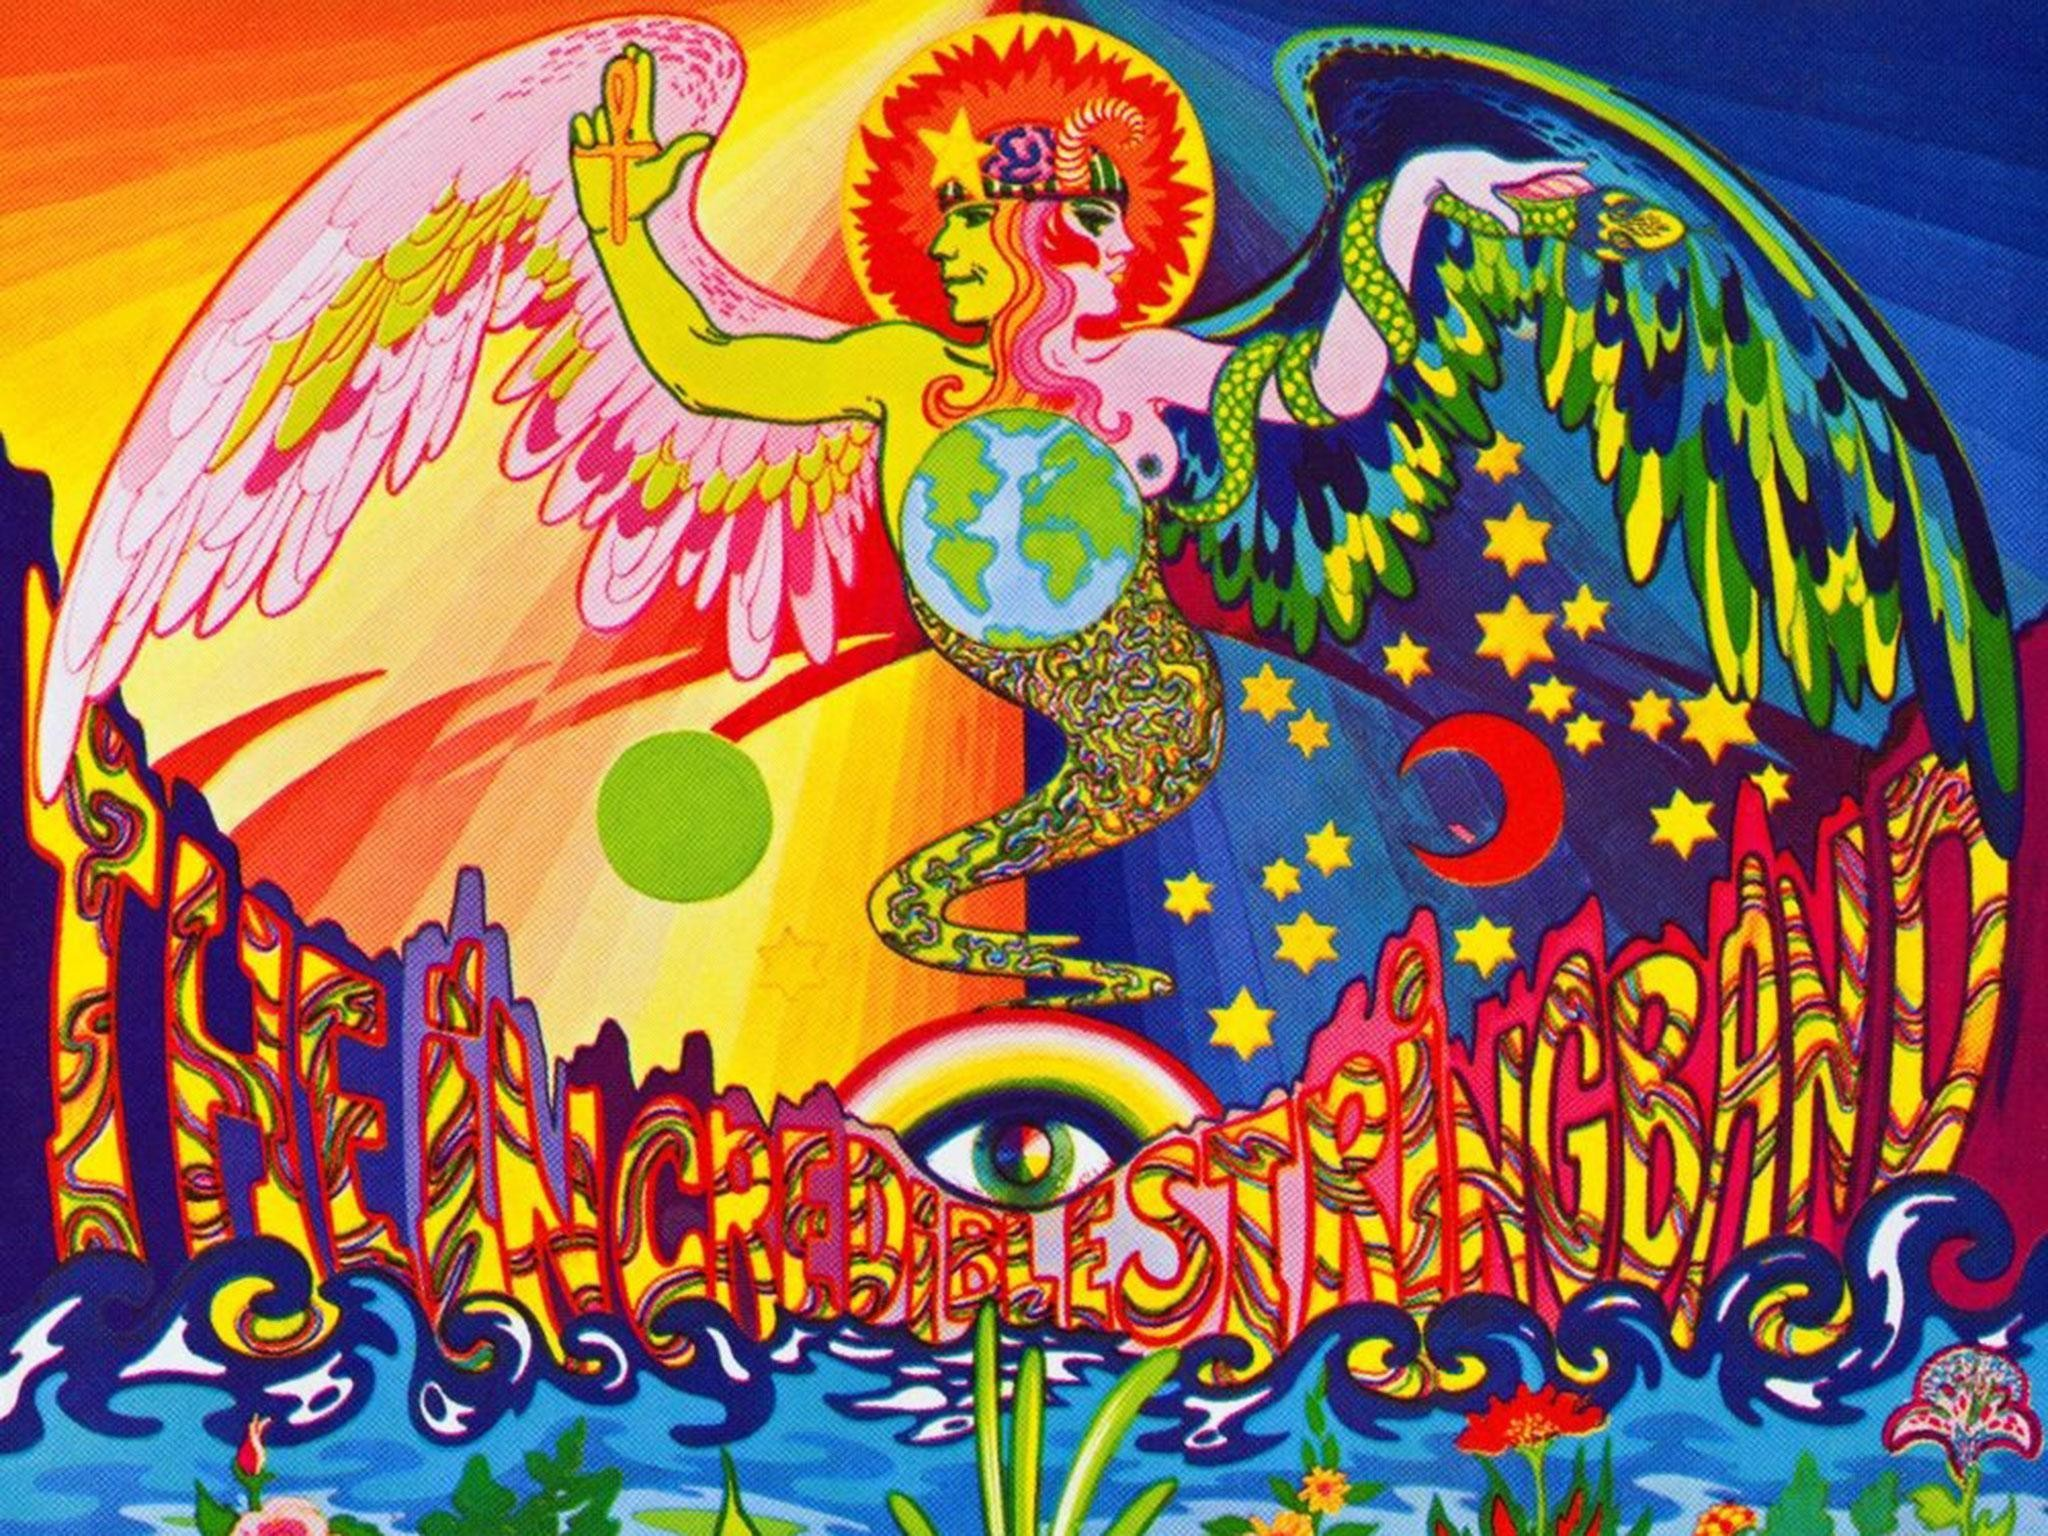 Jimi hendrix wallpaper 67 images - Jimi hendrix wallpaper psychedelic ...